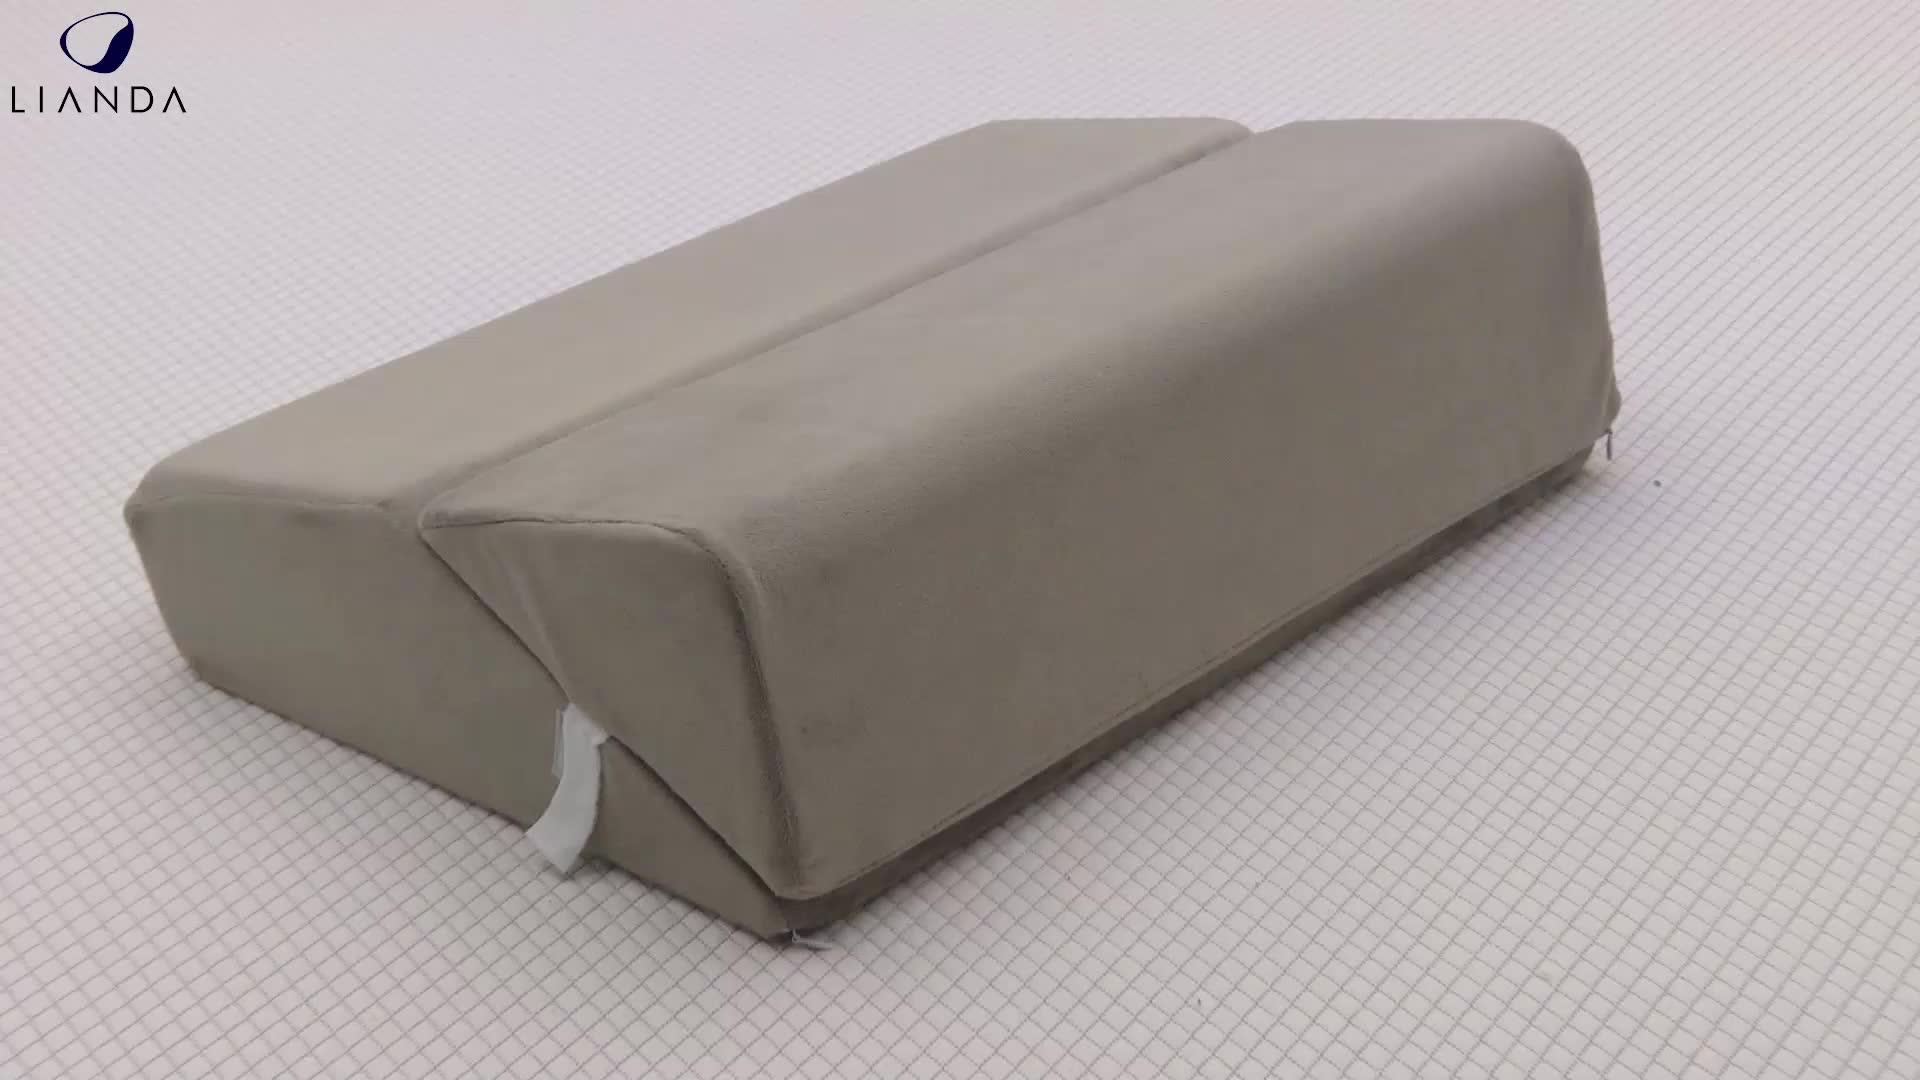 adjustable type wedge pdp broyhill pillow shop reviews sleep bed foam product memory gel